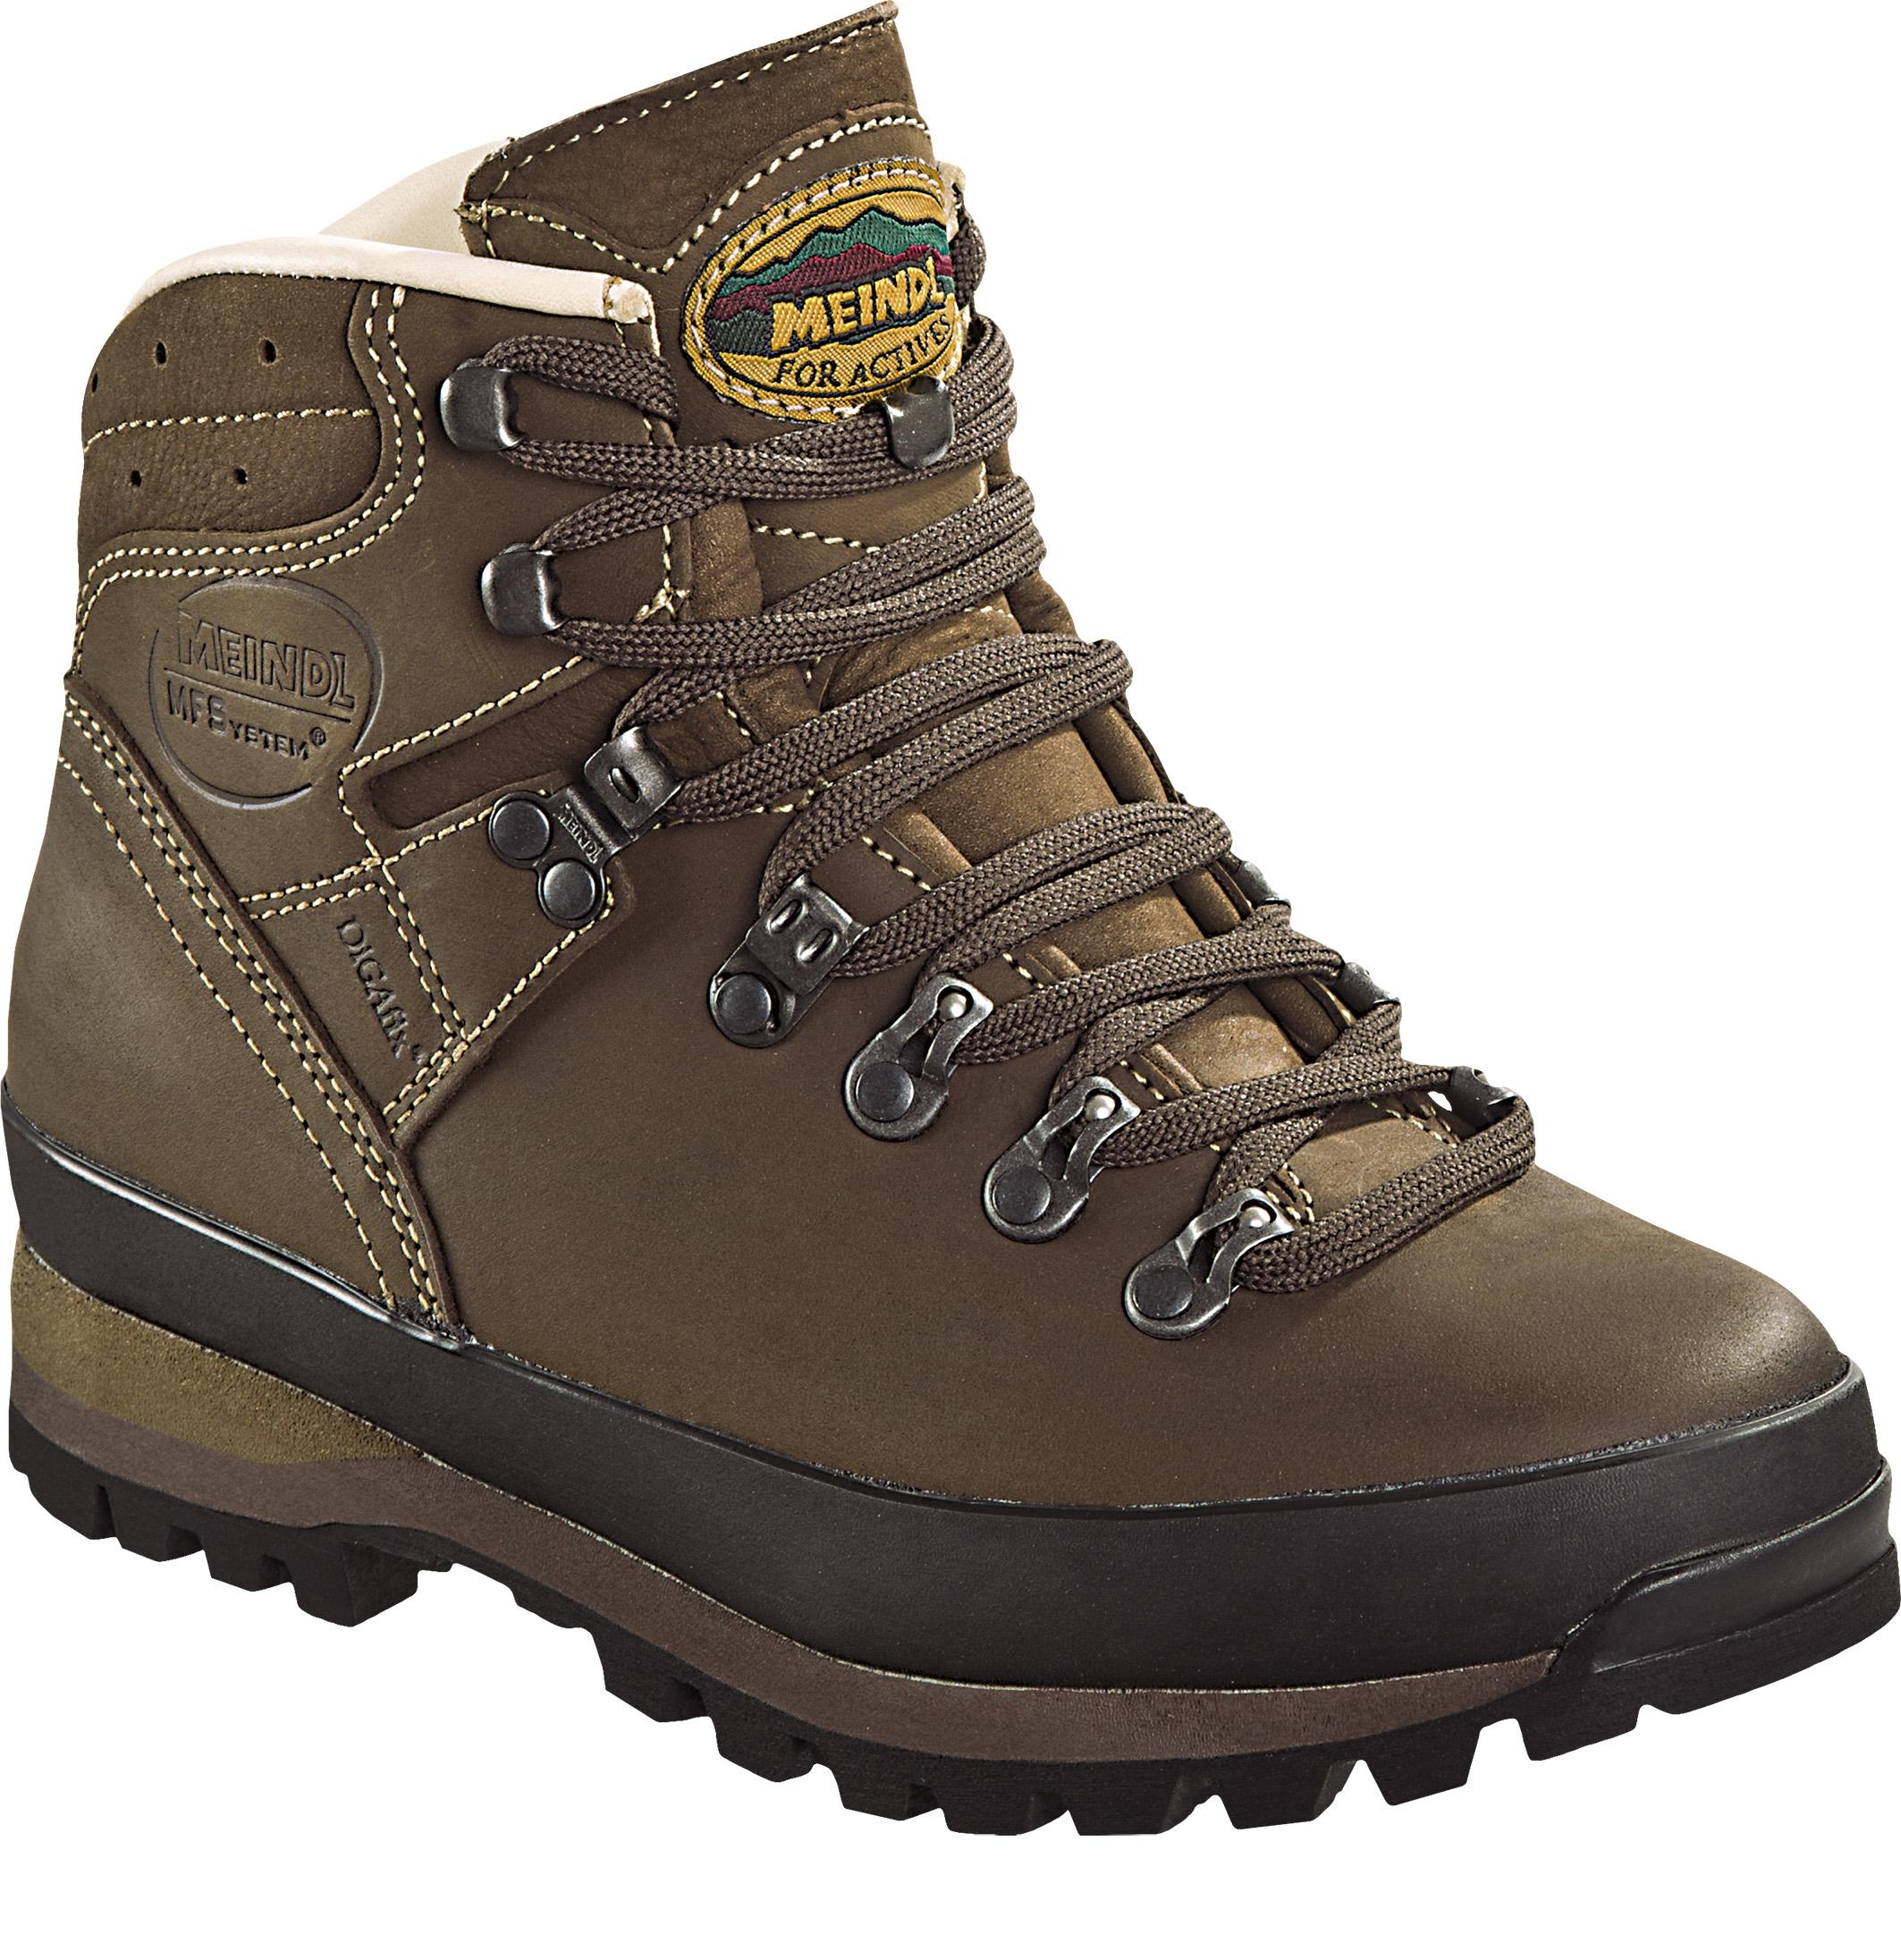 Meindl - Borneo Lady 2 MFS - Hiking Boots - Women's